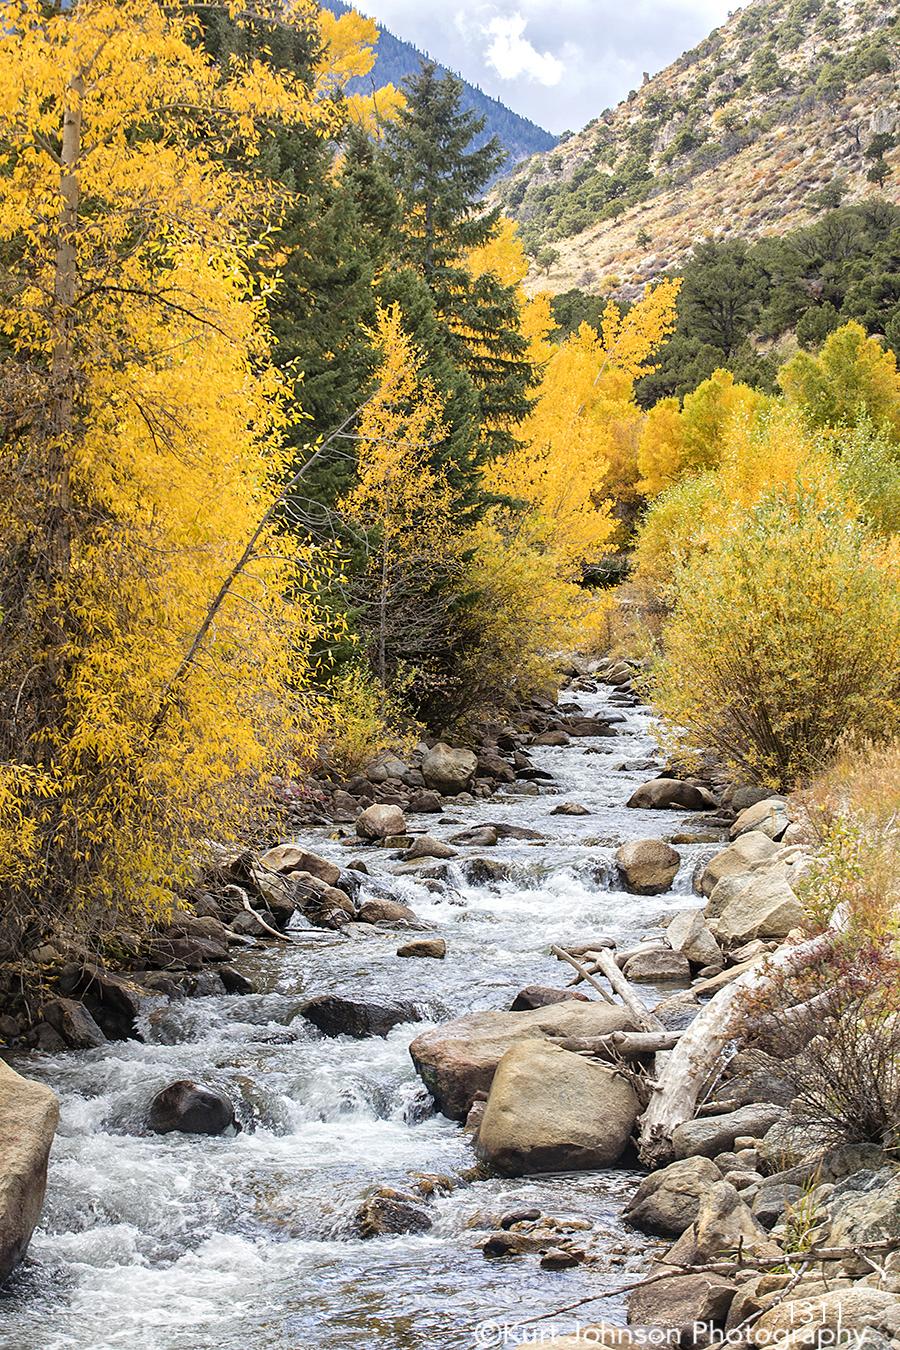 water rocks stones yellow green trees river stream landscape Colorado waterscape